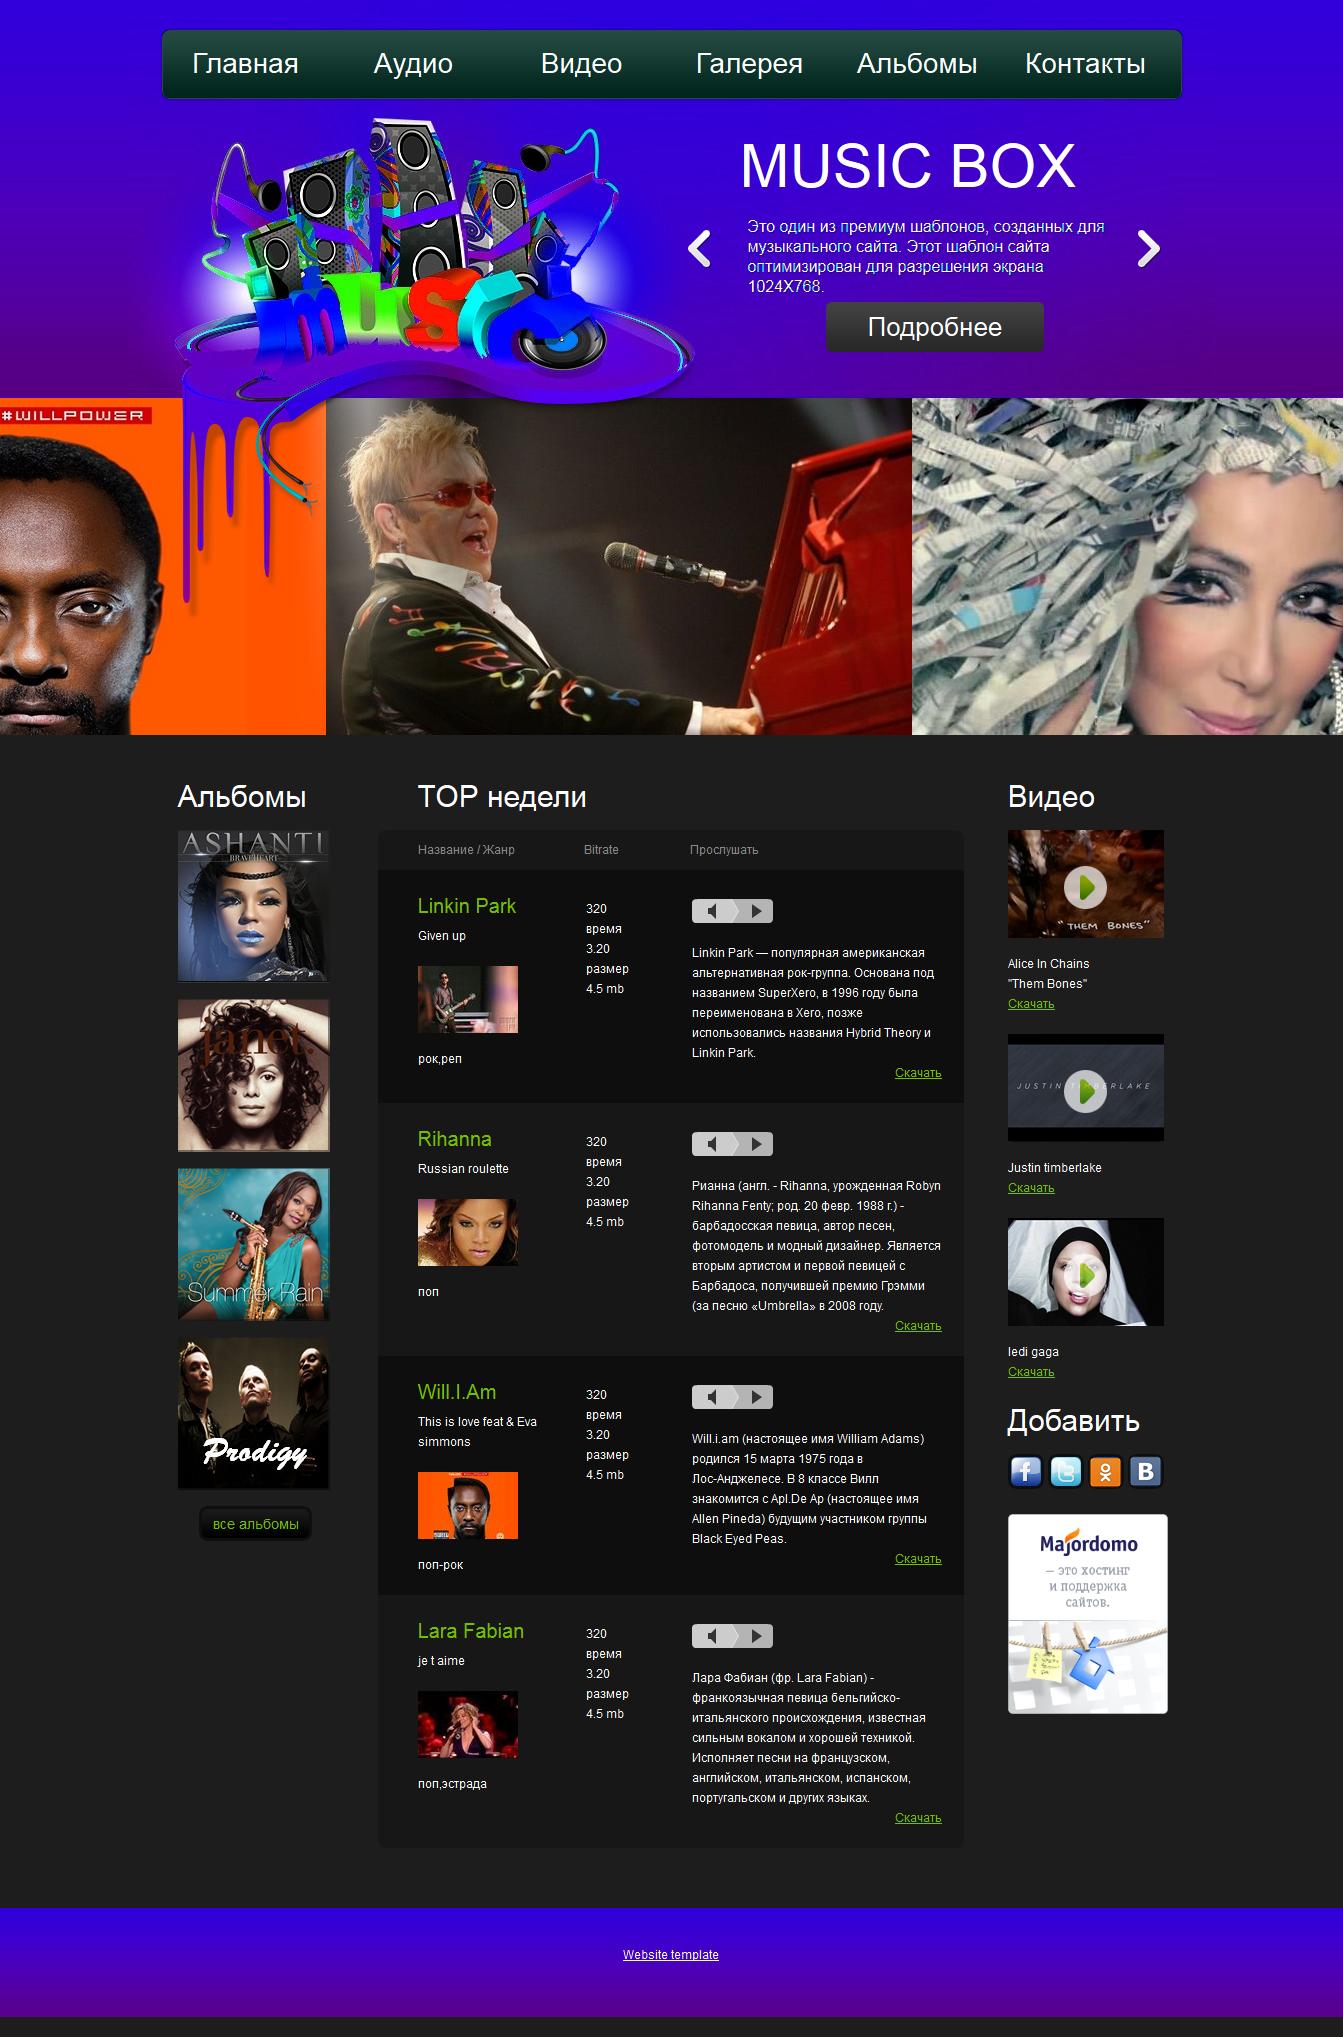 Gk musicity - шаблон для музыкального сайта joomla 15, 17, 25